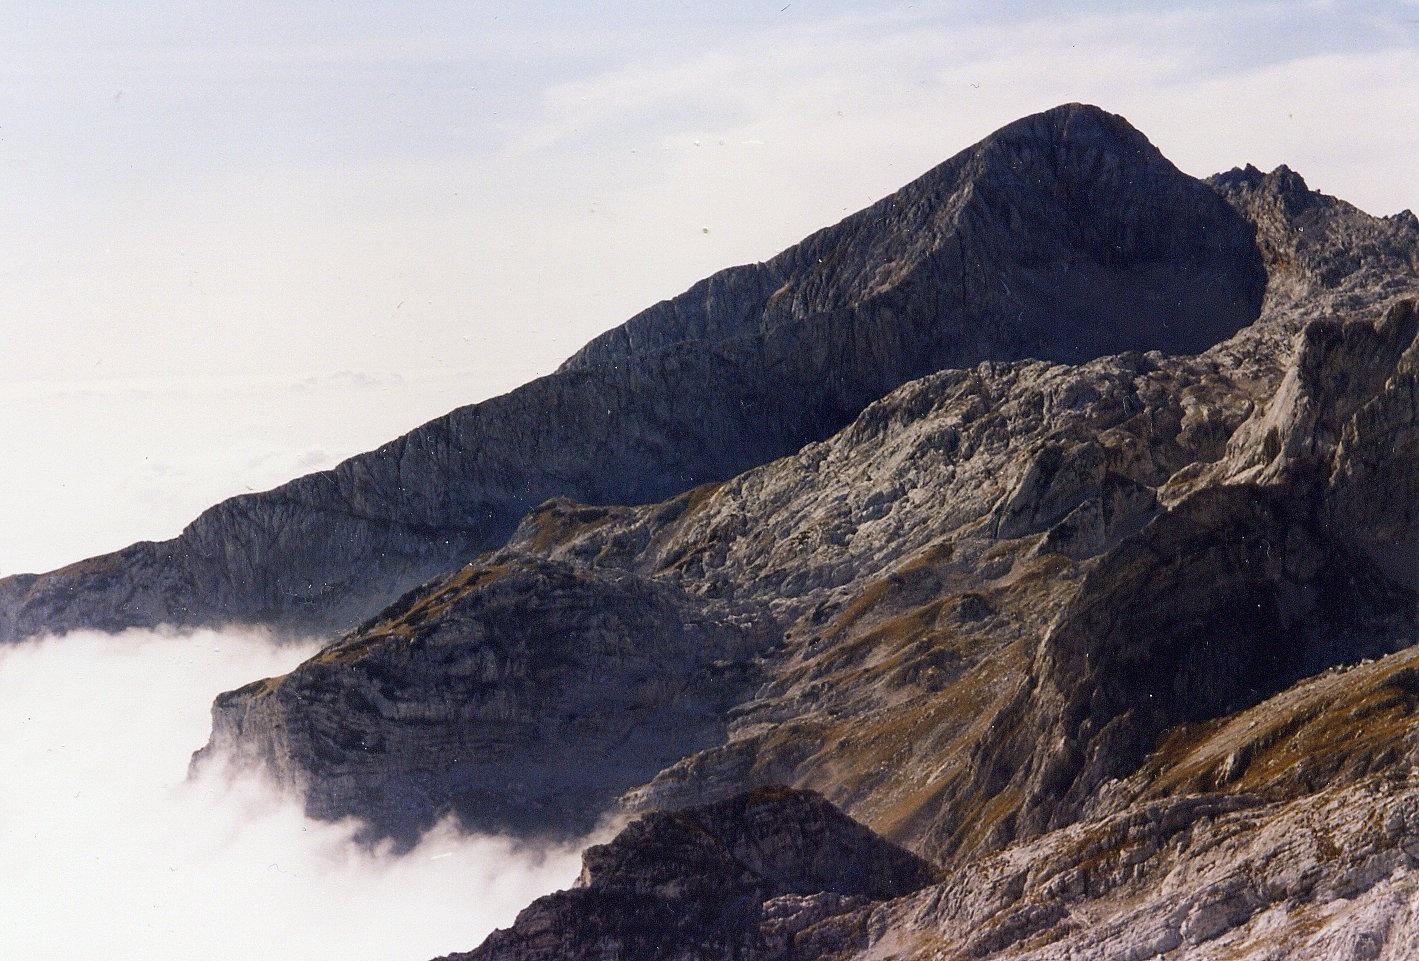 GRINTOVEC 2558m, Kamniške alpe 1990.10.05. by zvnktomasevic